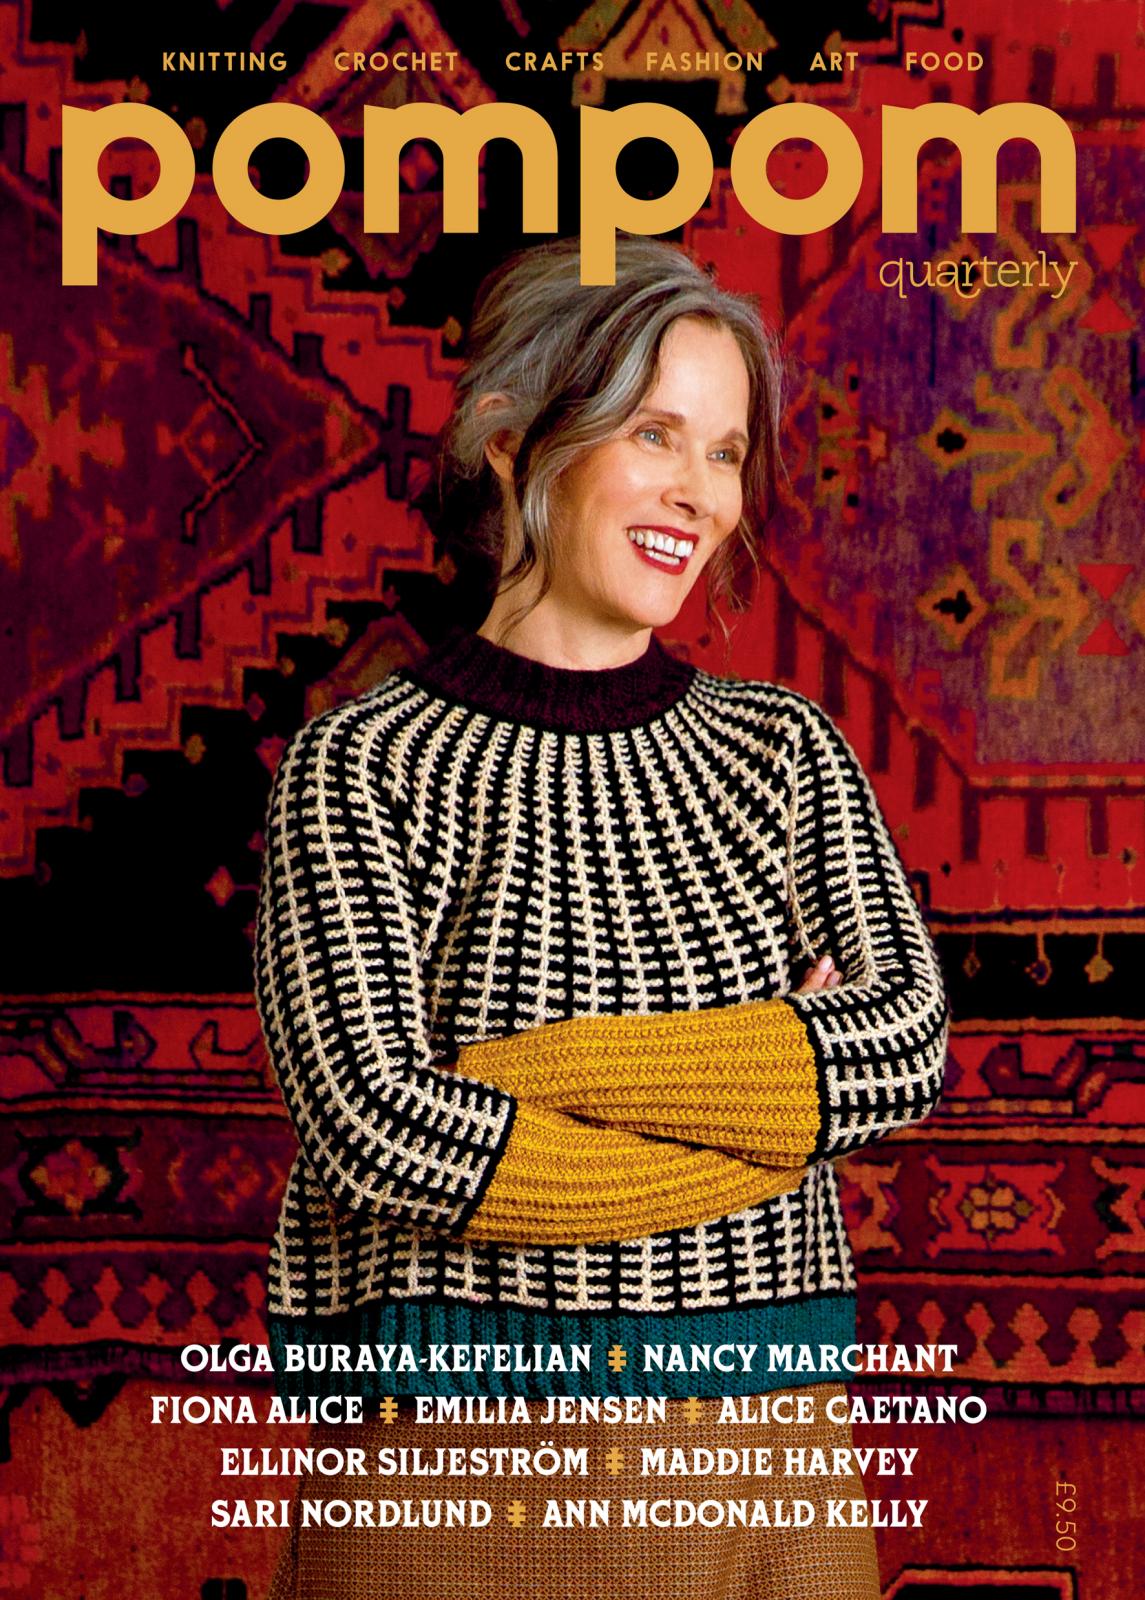 Pompom Quarterly Autumn 2017-Issue 22